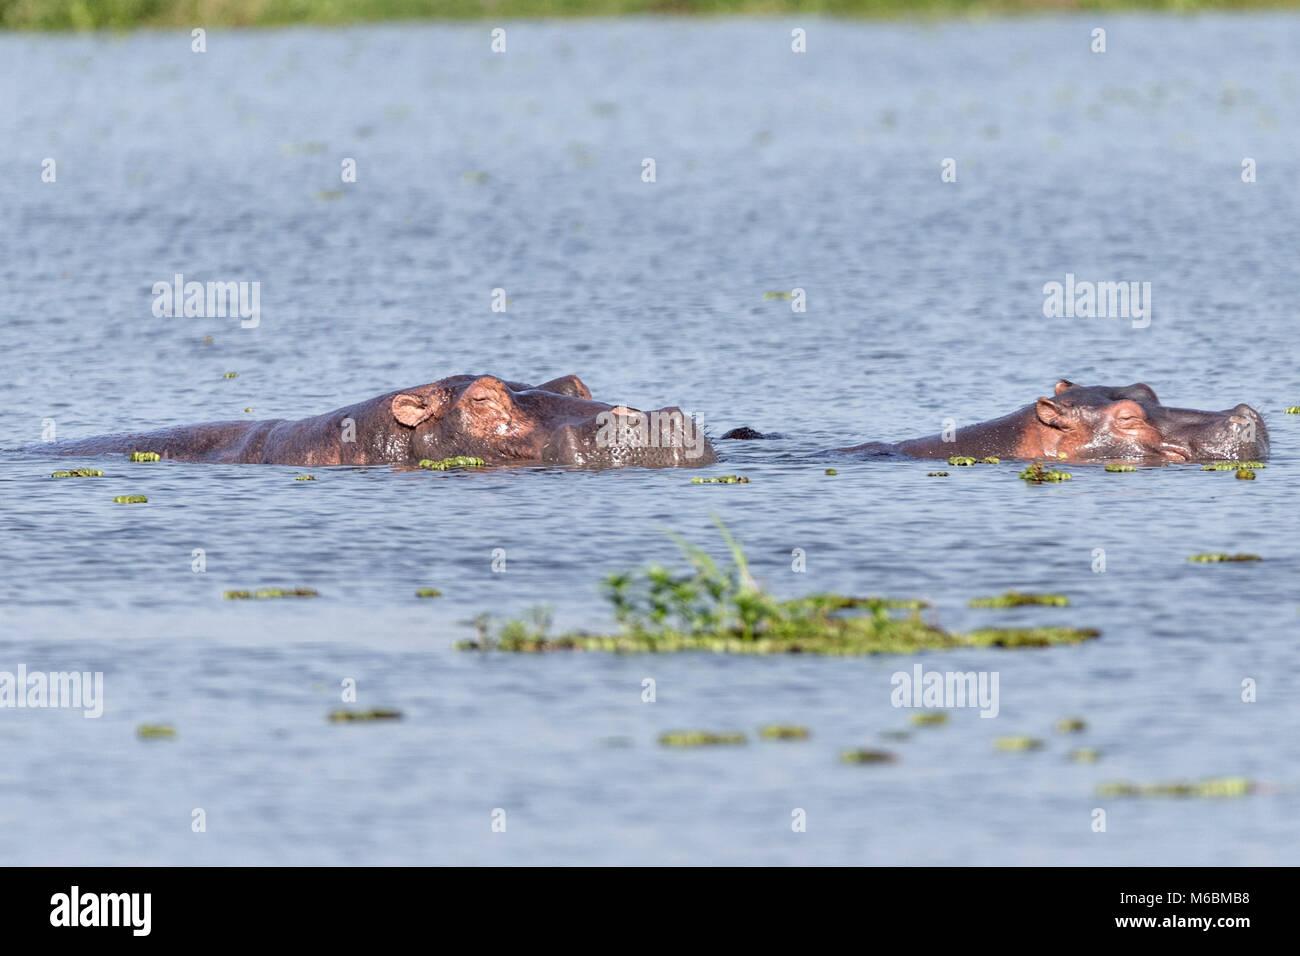 Hippopotamuses sleeping in Lake Victoria ,'Murchison's Falls National Park', Uganda, Africa - Stock Image